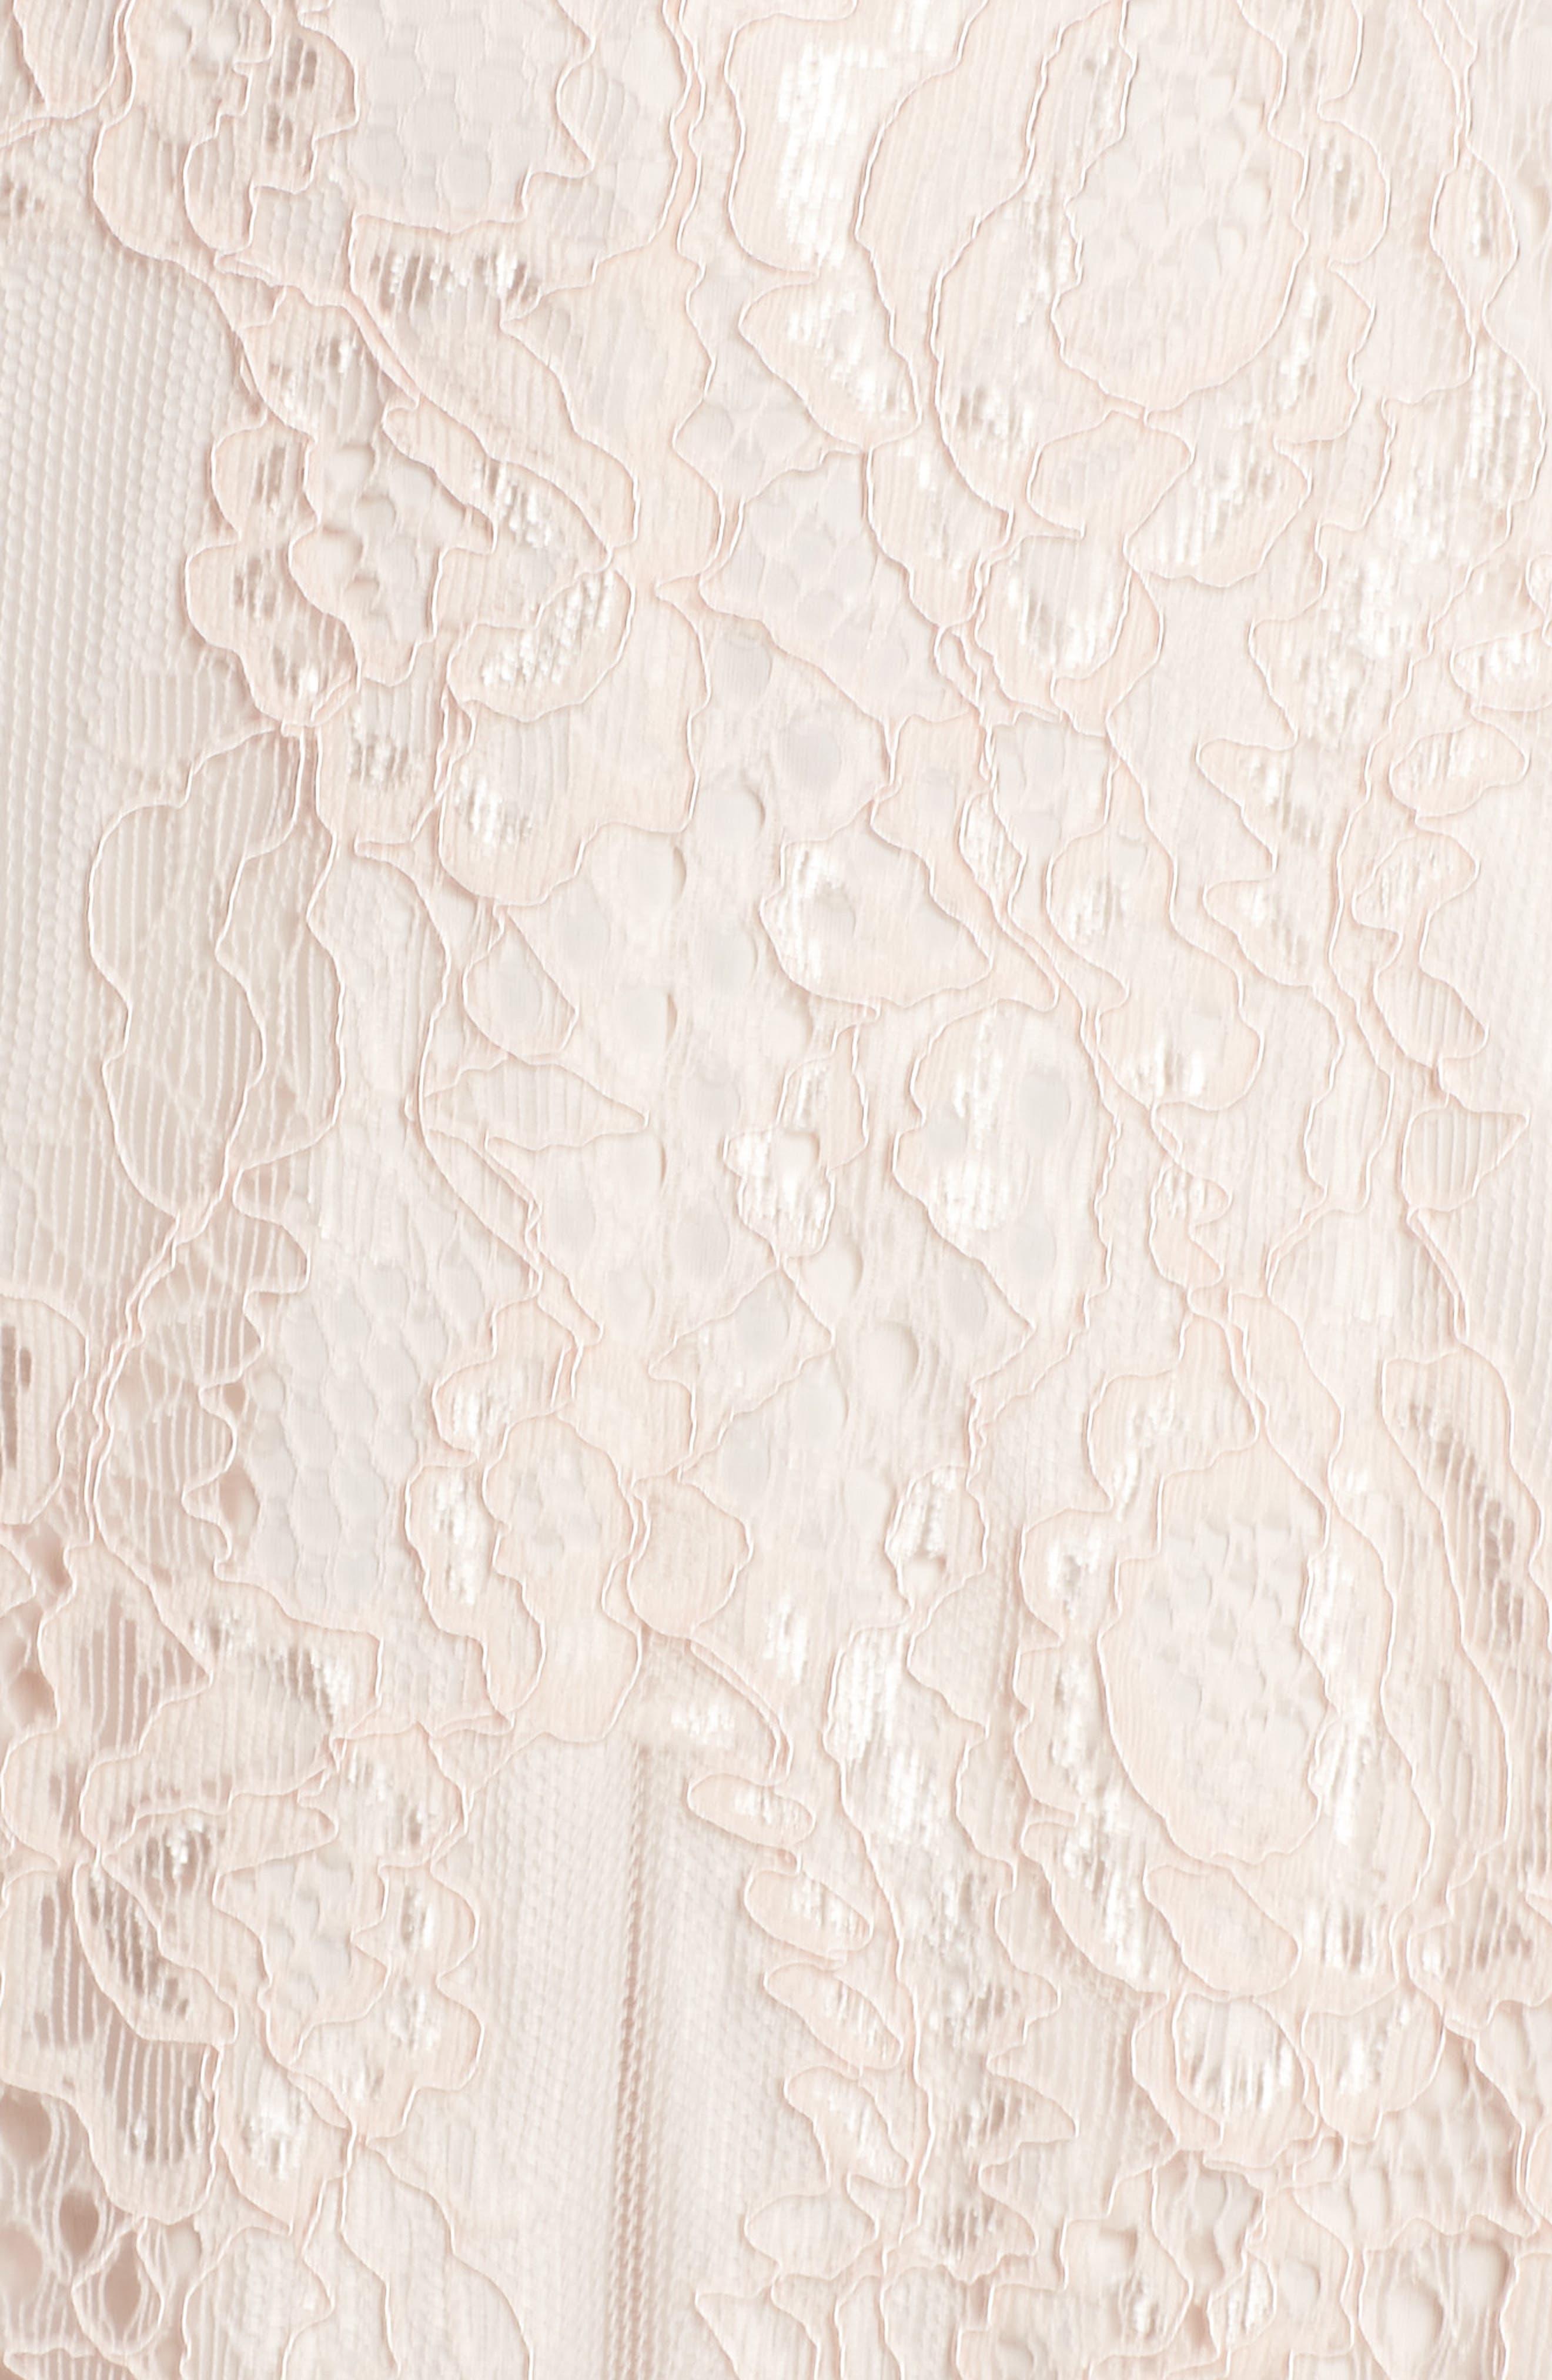 Rose Lace Fit & Flare Dress,                             Alternate thumbnail 5, color,                             Blush/ Almond